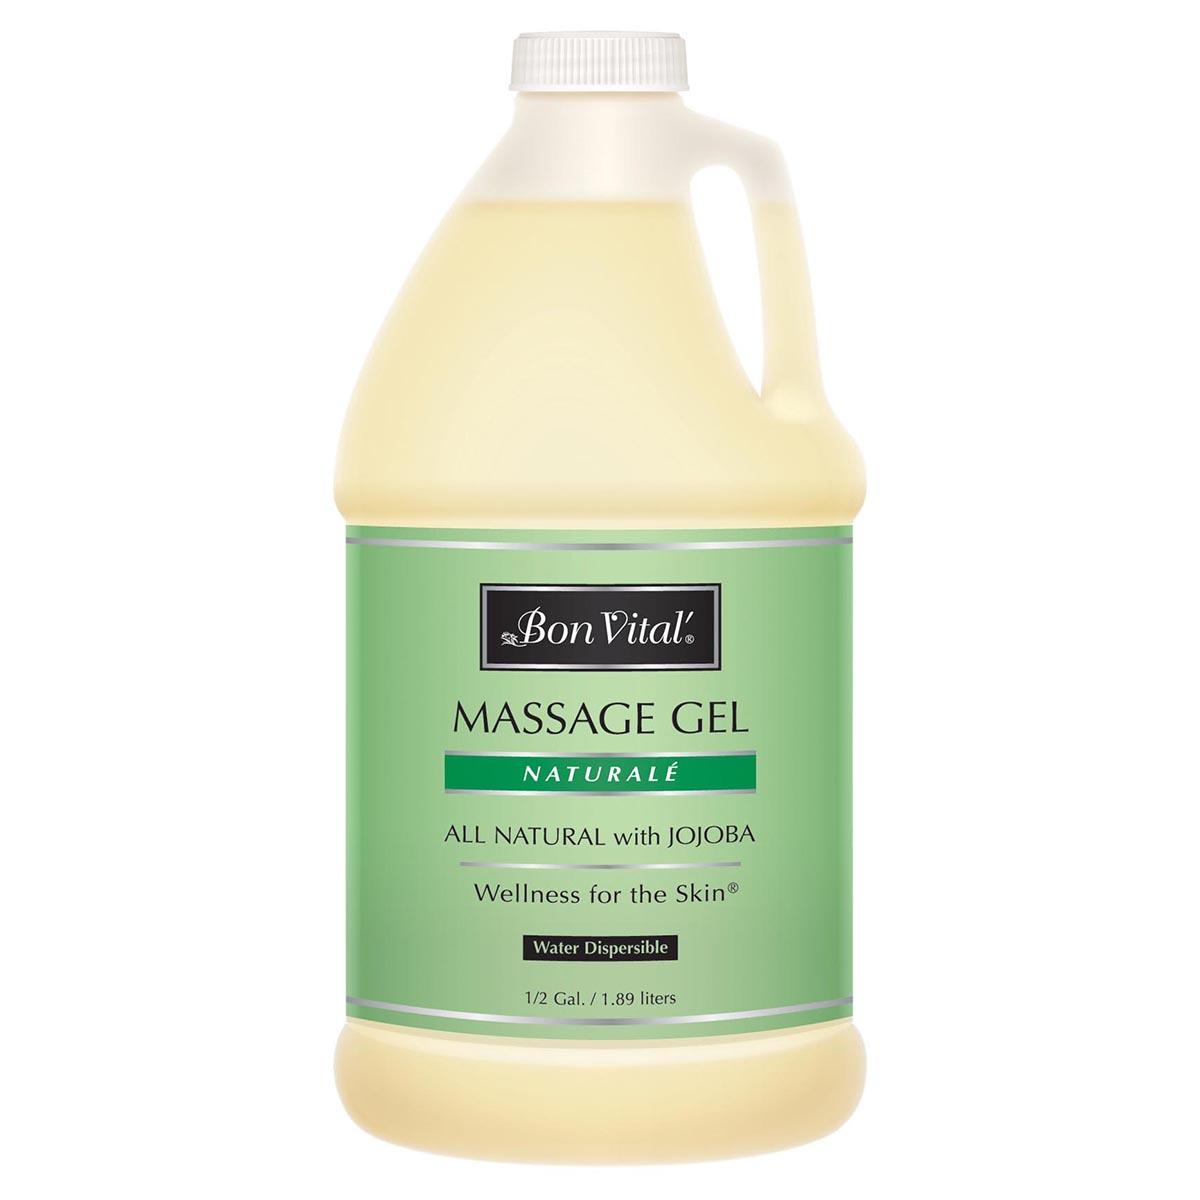 bon vital natural gel massage lotions oils and creams. Black Bedroom Furniture Sets. Home Design Ideas